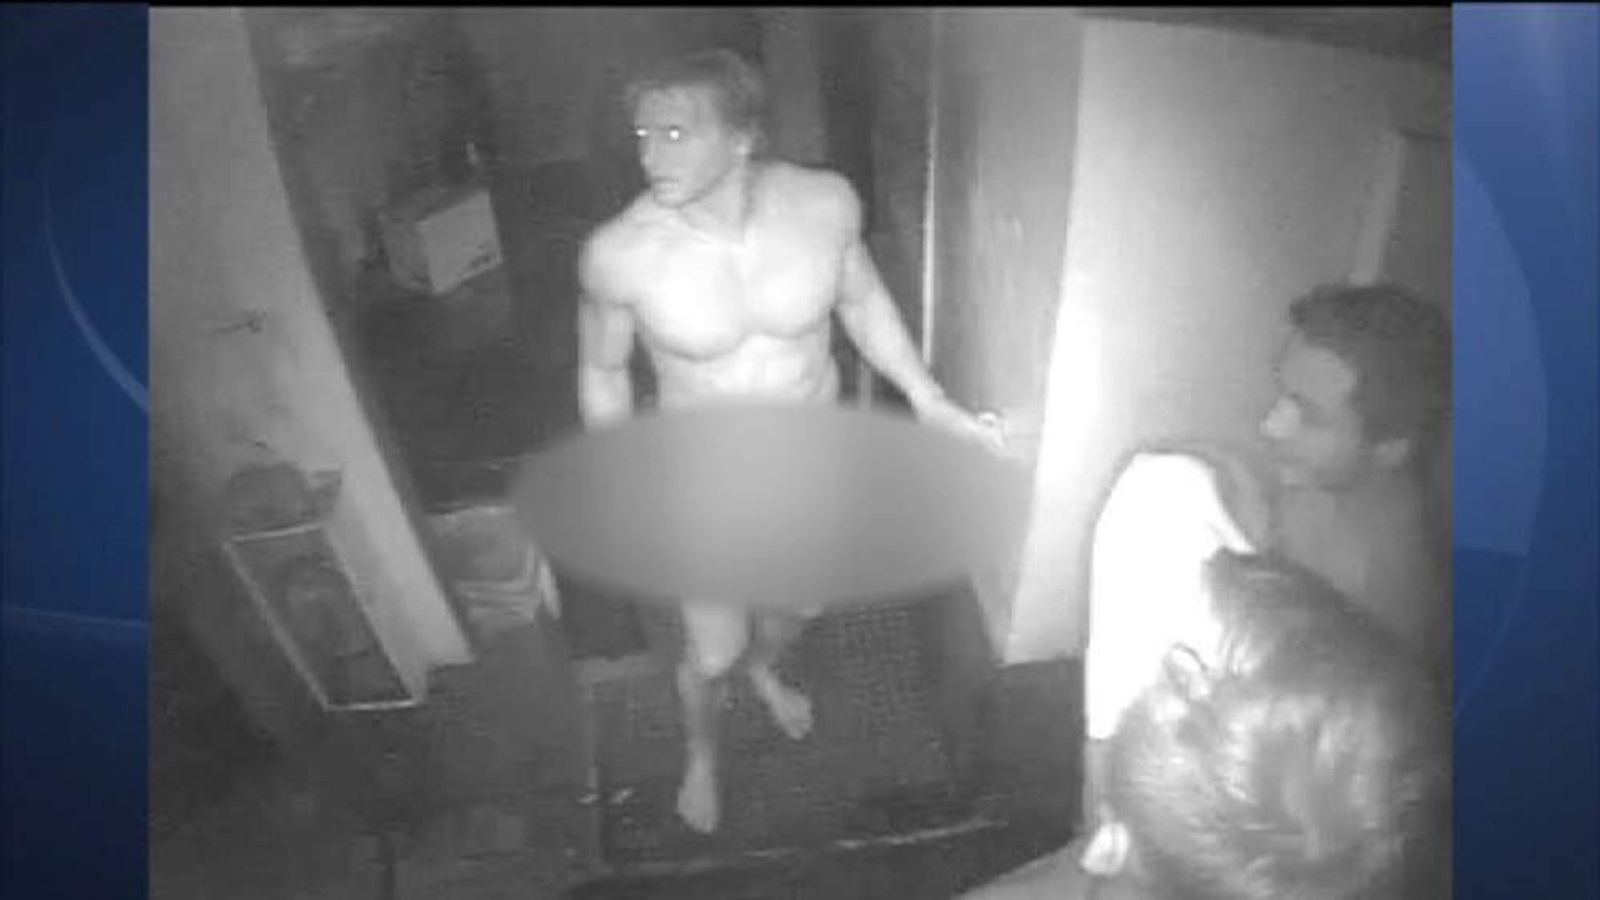 Three naked burglars caught on CCTV stealing hamburgers